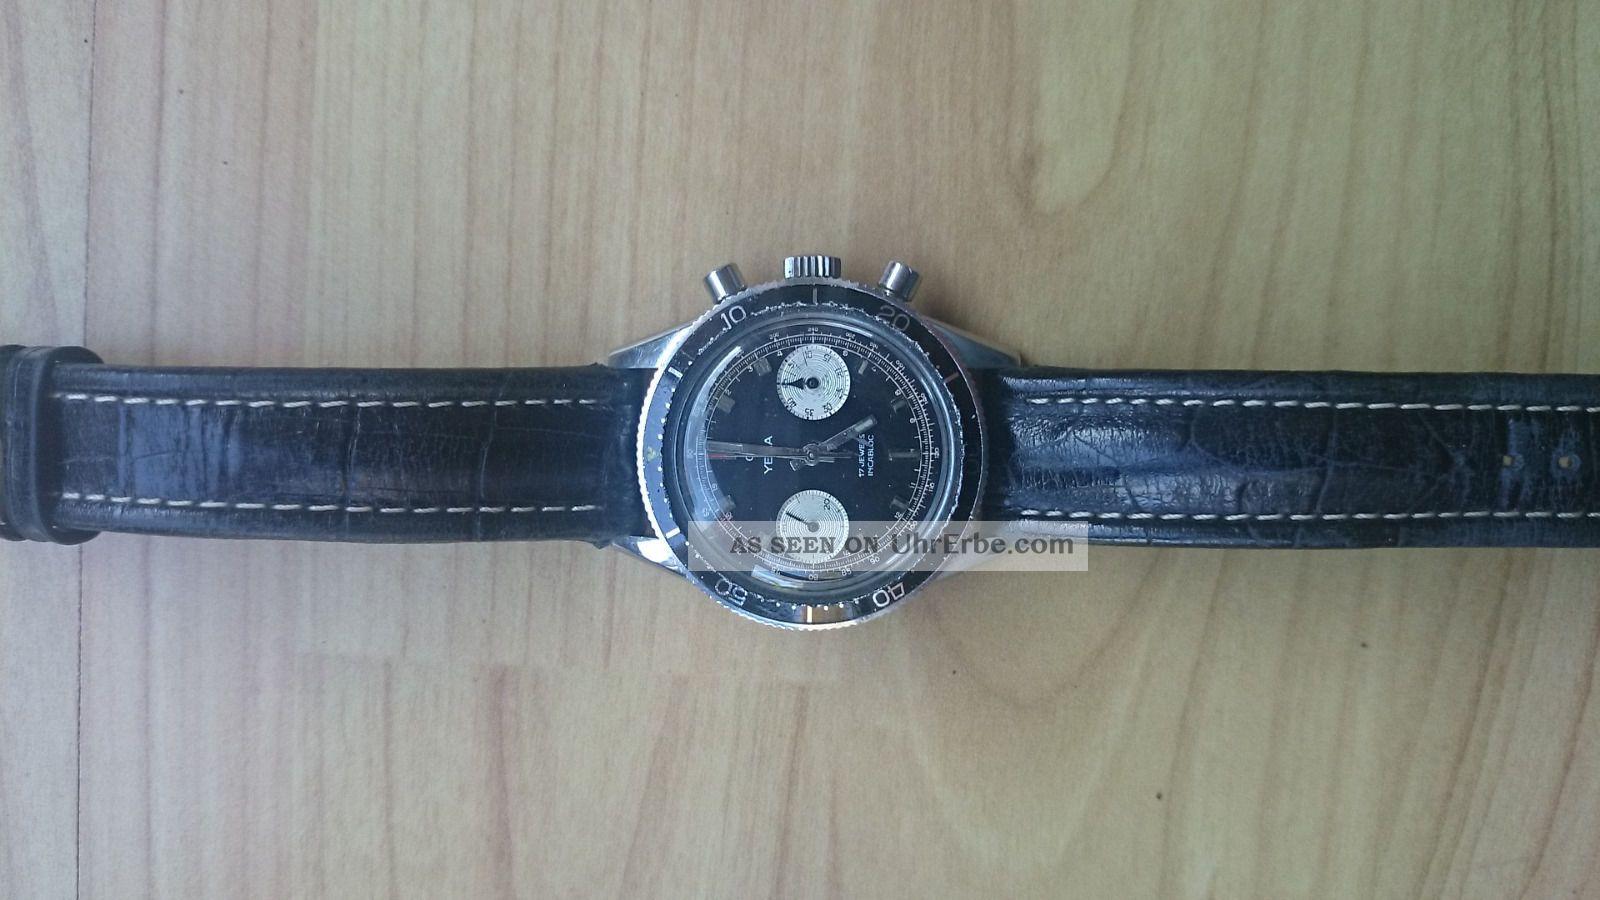 Yema Chronograph Handaufzug Valjoux 7730 Sammlerstück Armbanduhren Bild